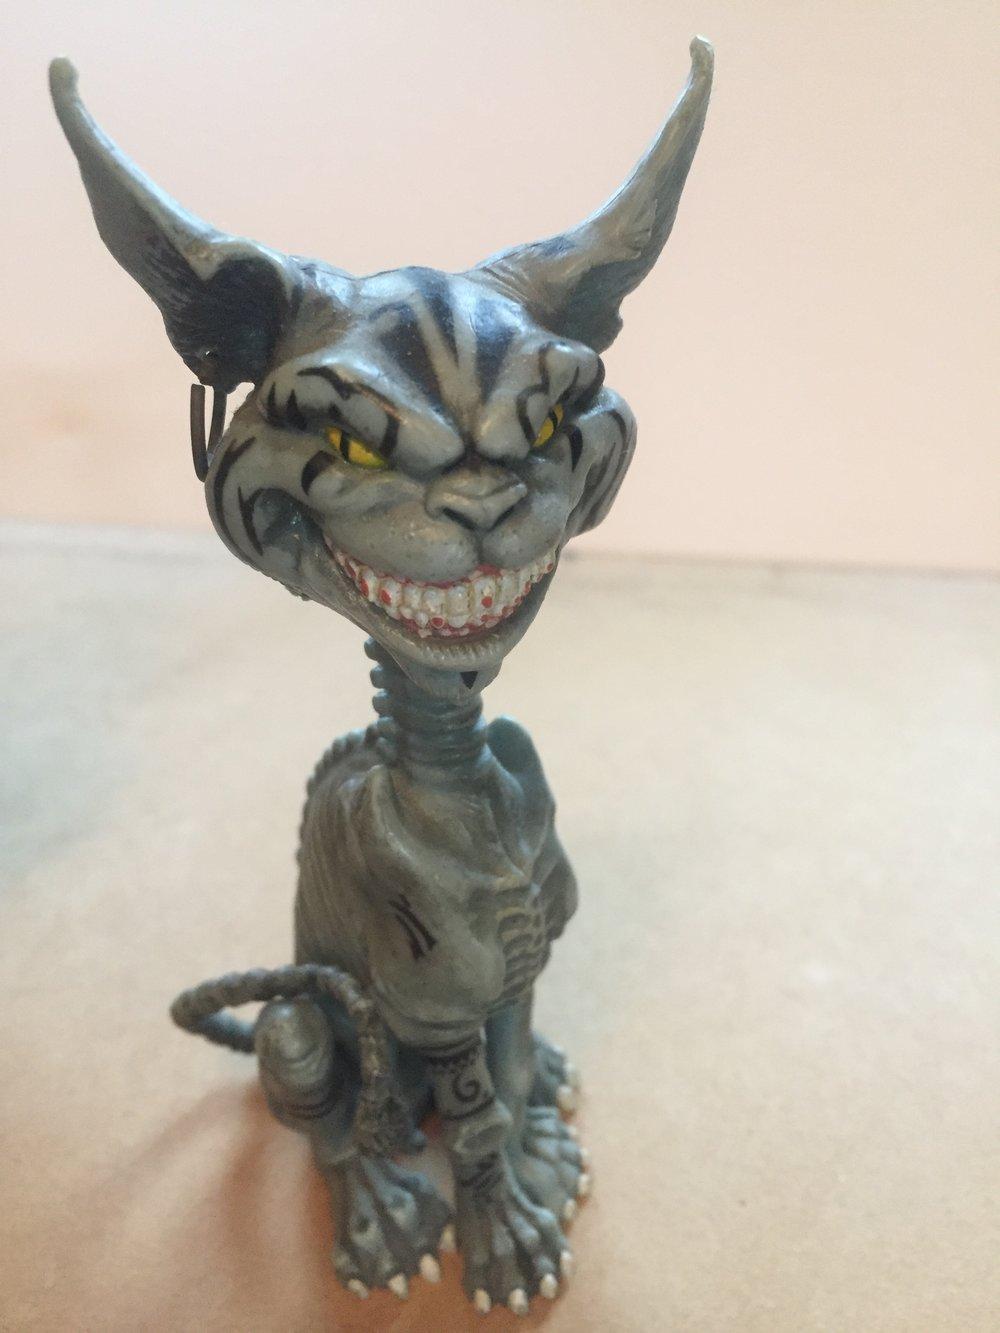 American McGee's Cheshire Cat